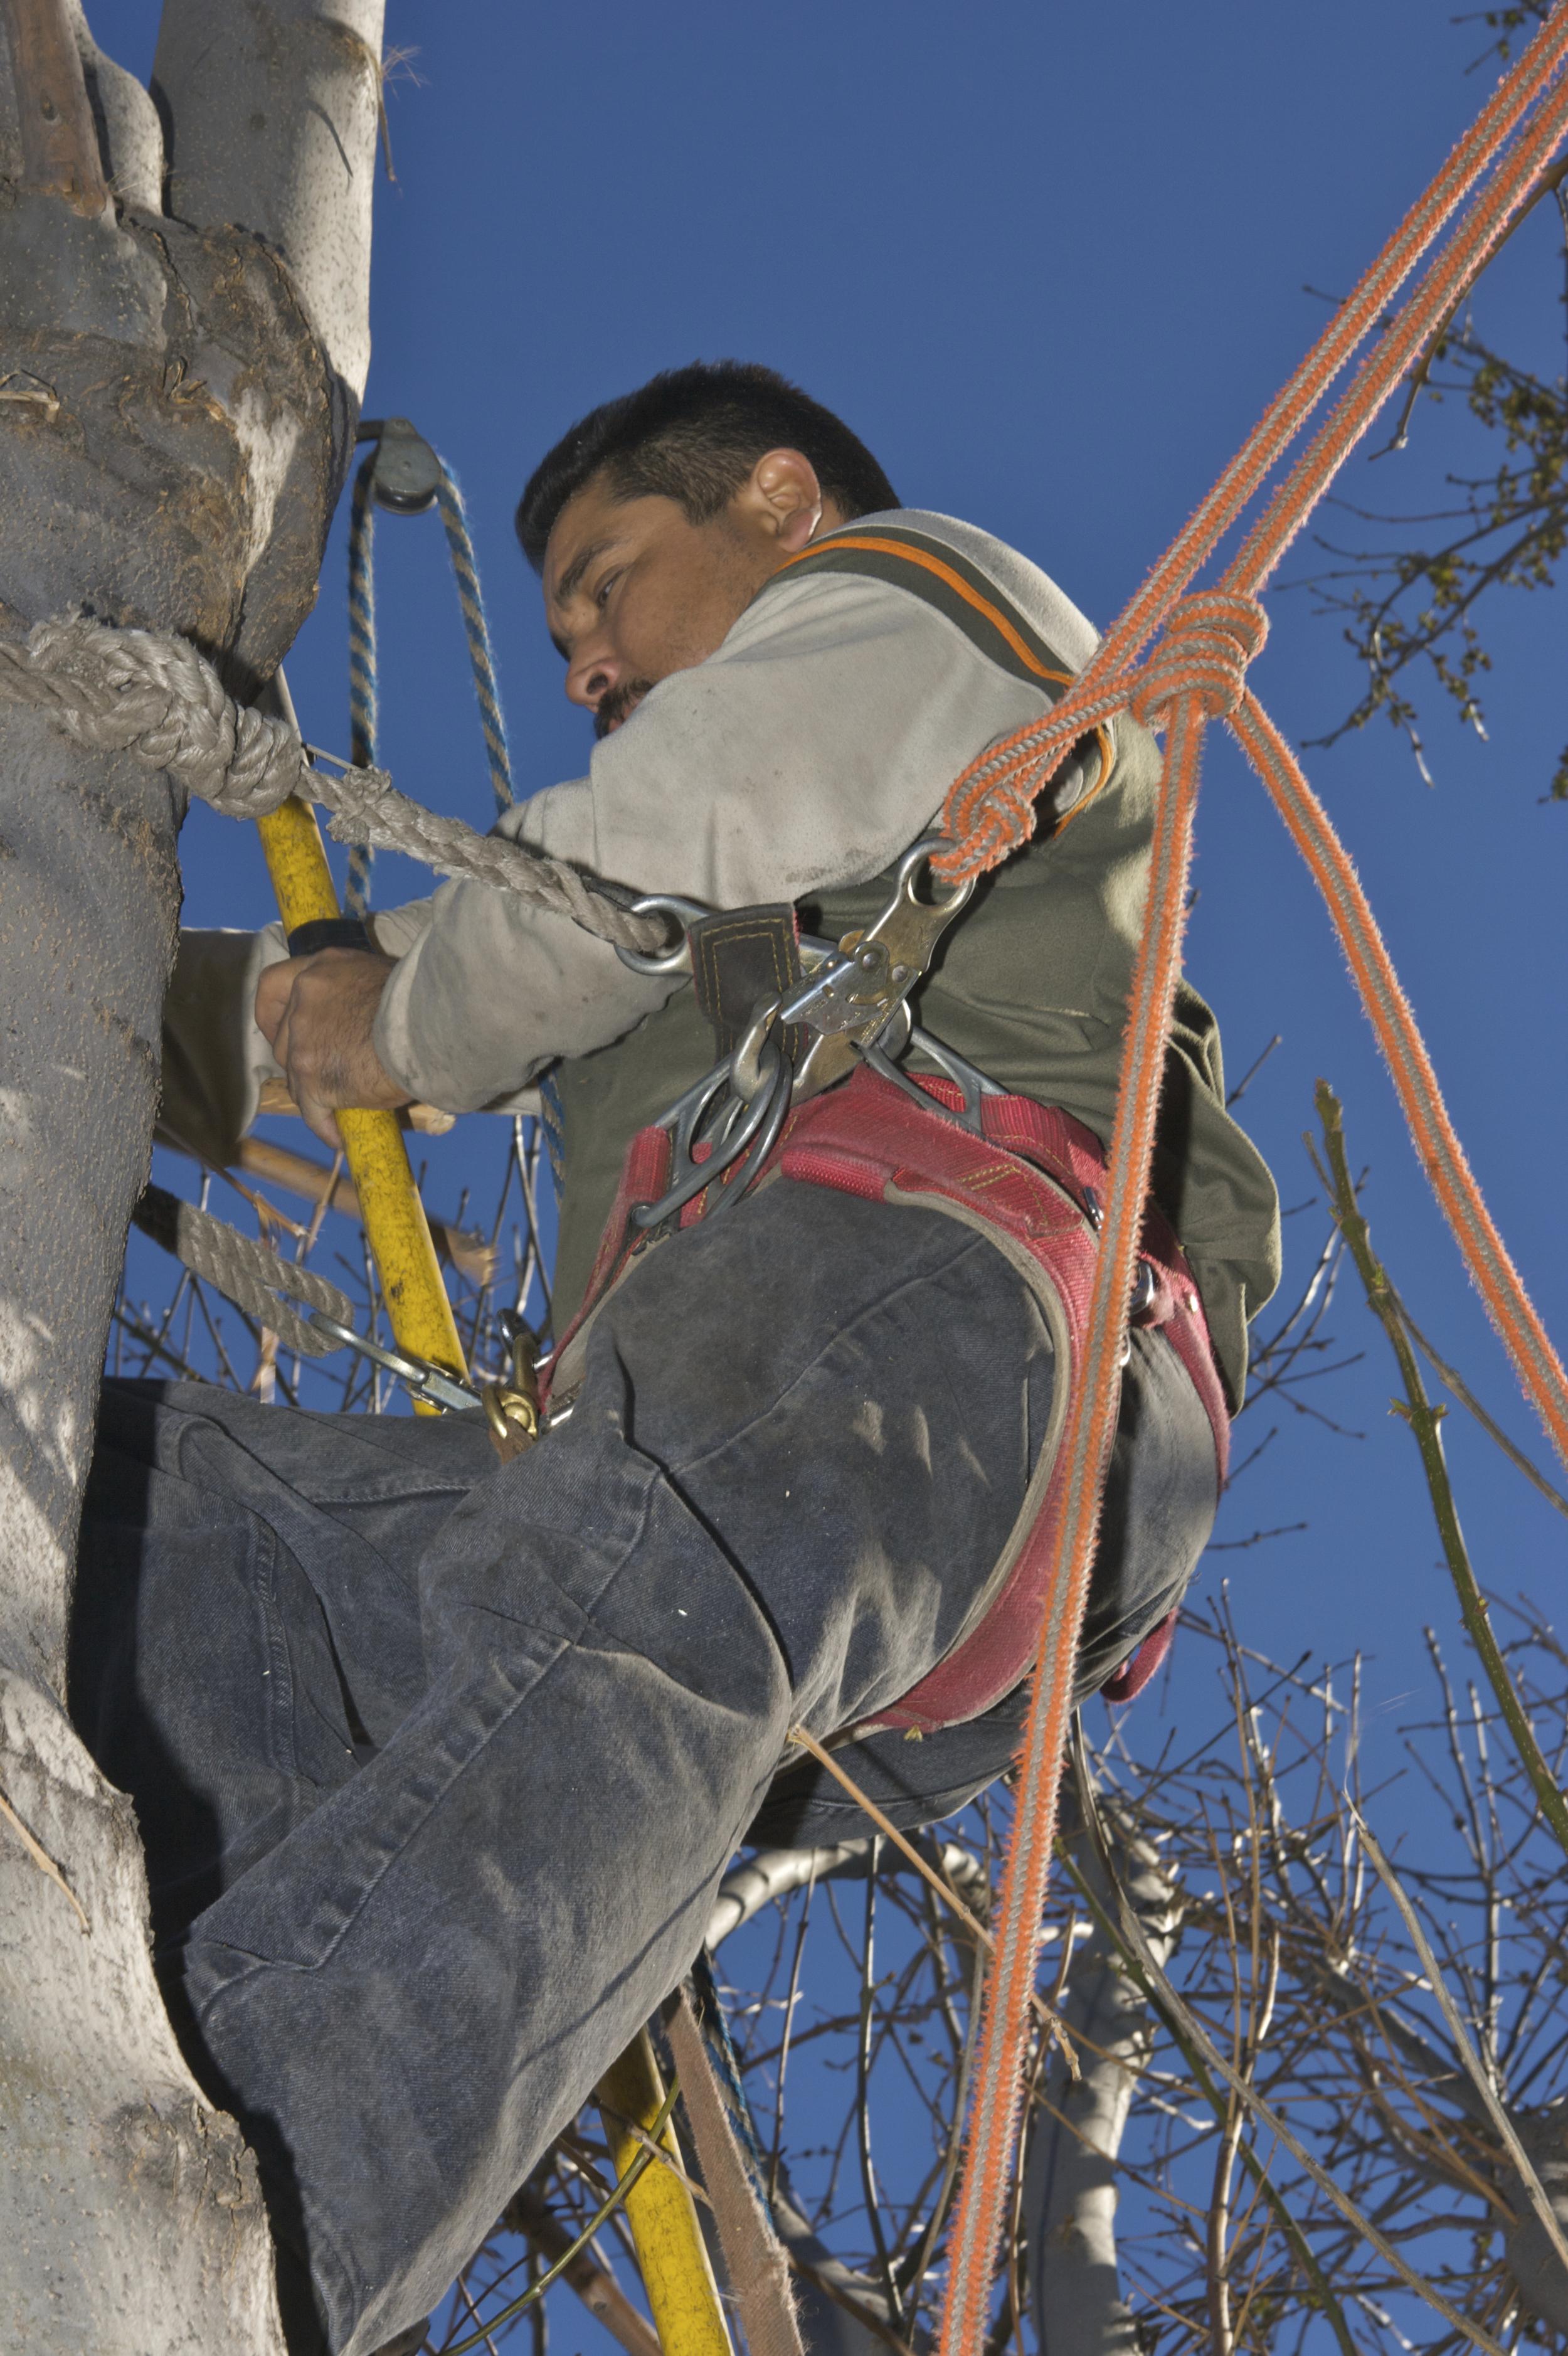 Copy of Copy of Rope, arborist, climbing